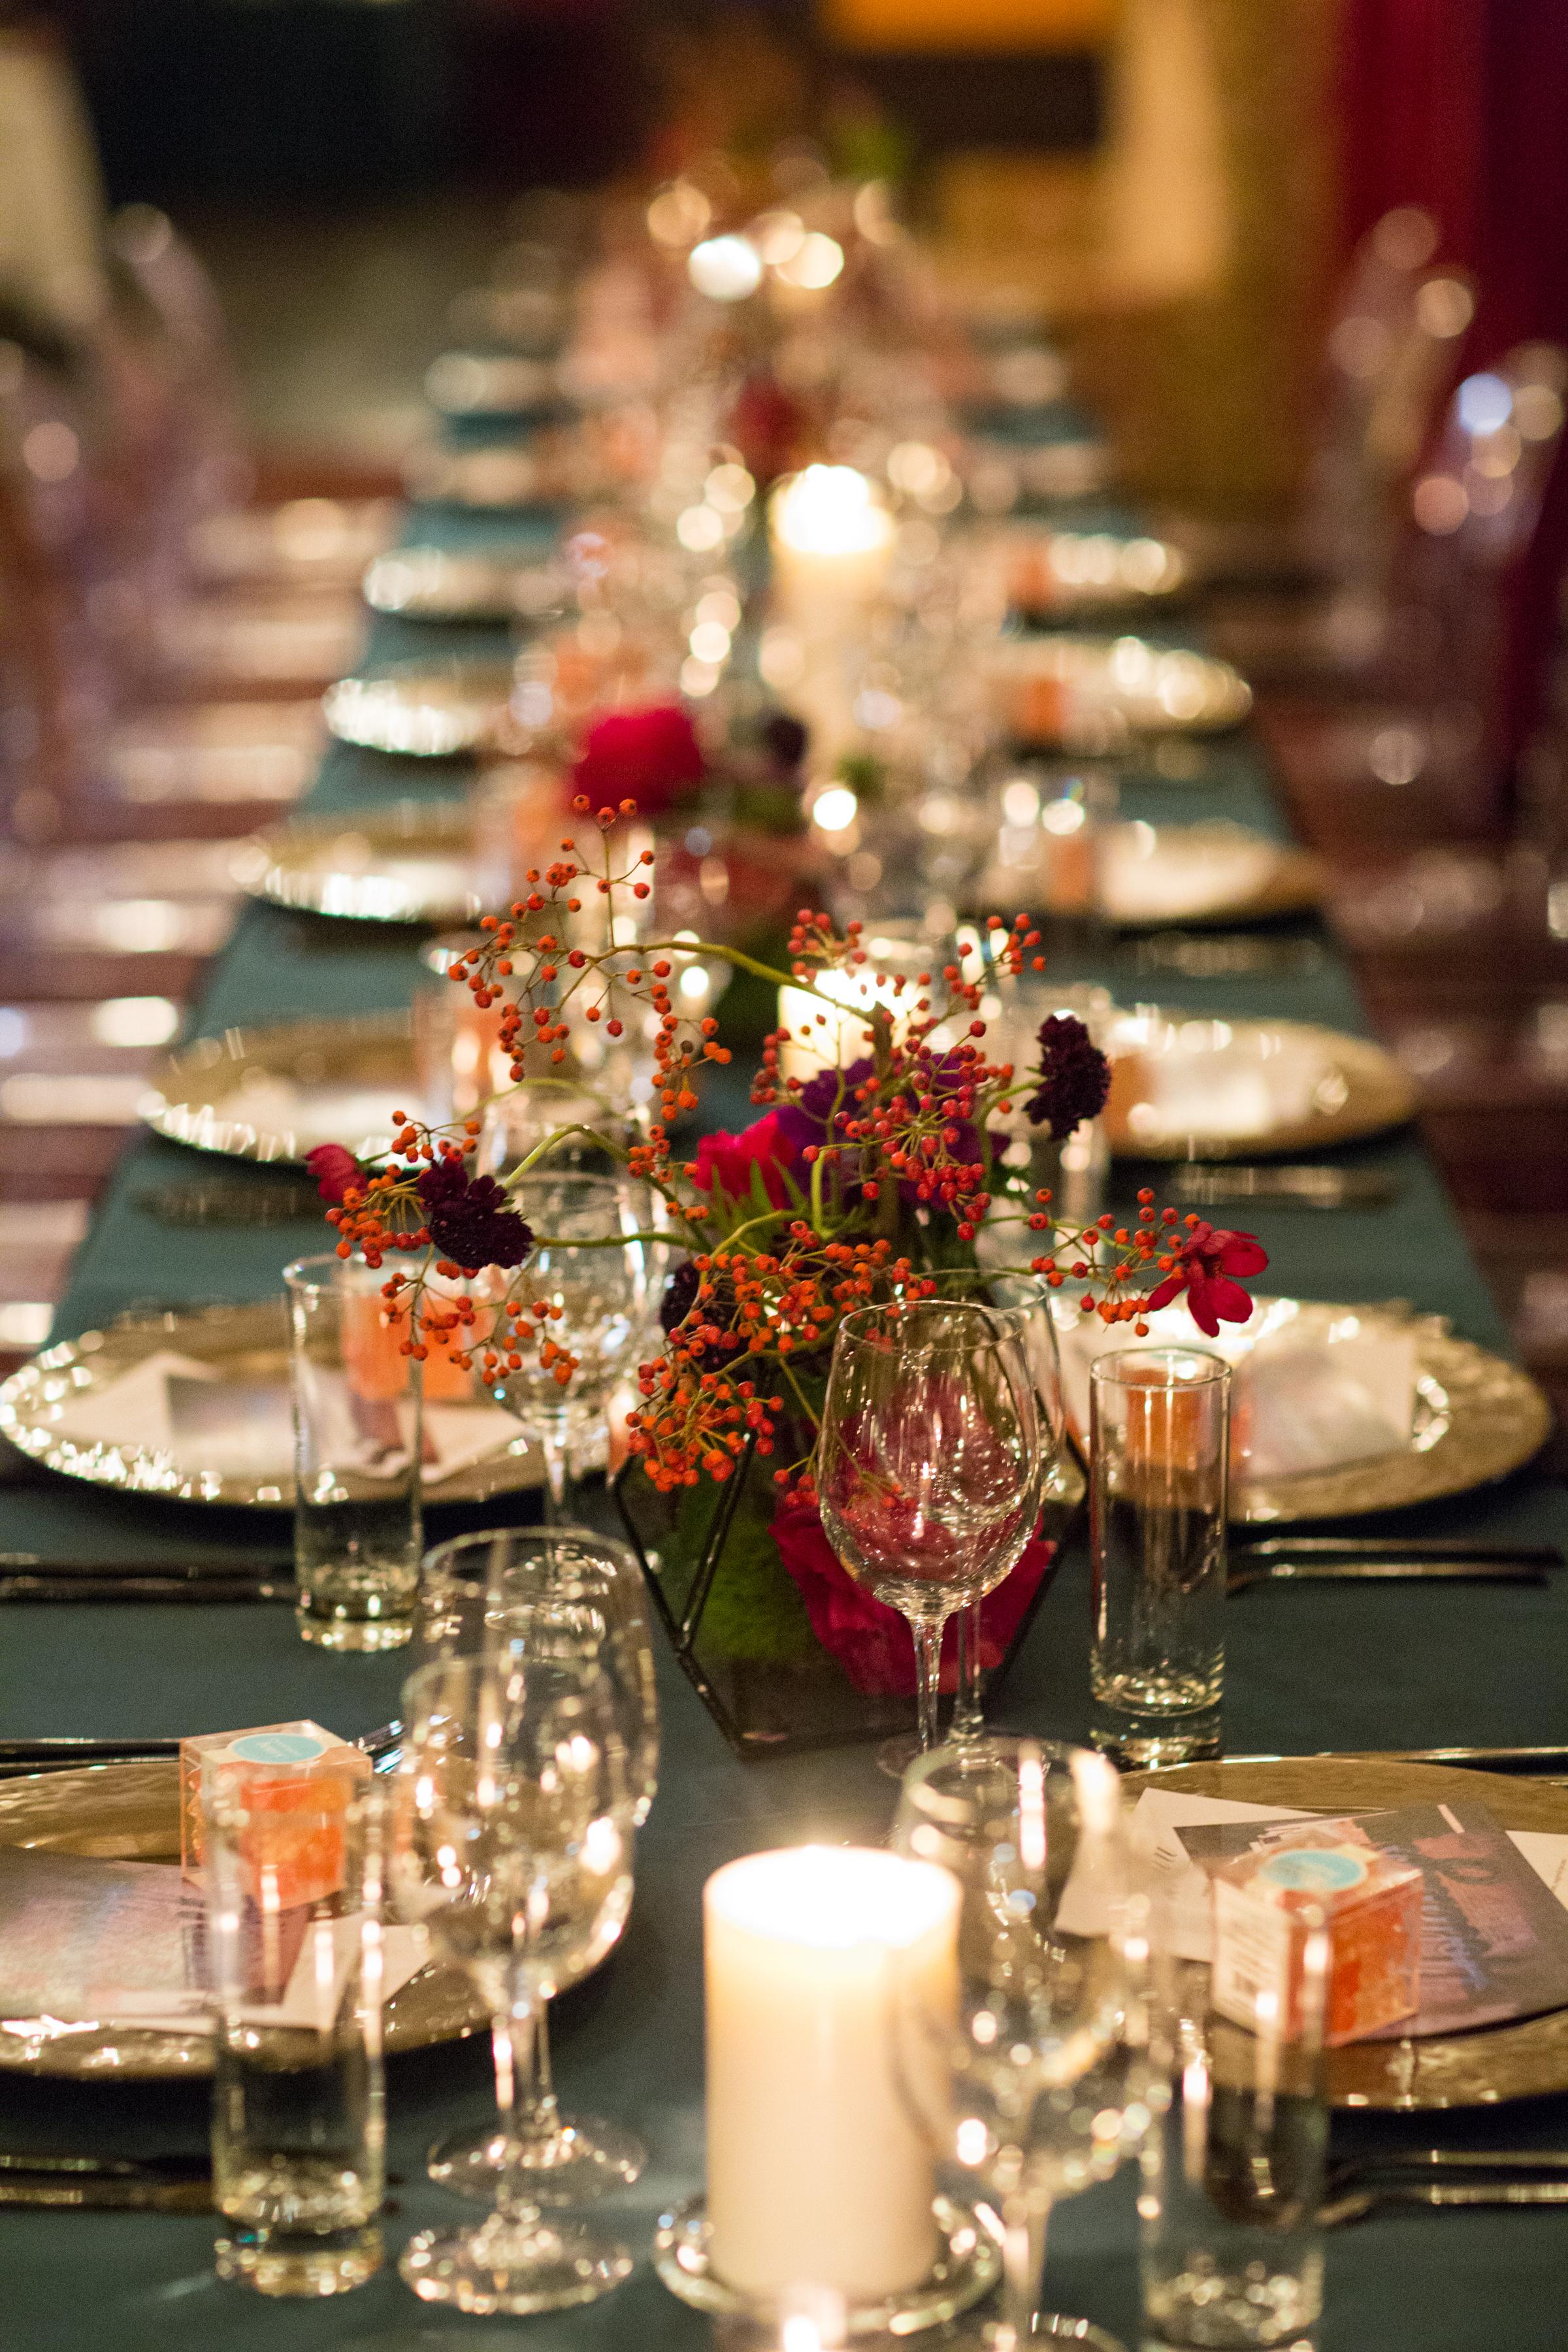 Gramercy-Park-Hotel-Holiday-Party-Andrea-Freeman-Events-2.JPG